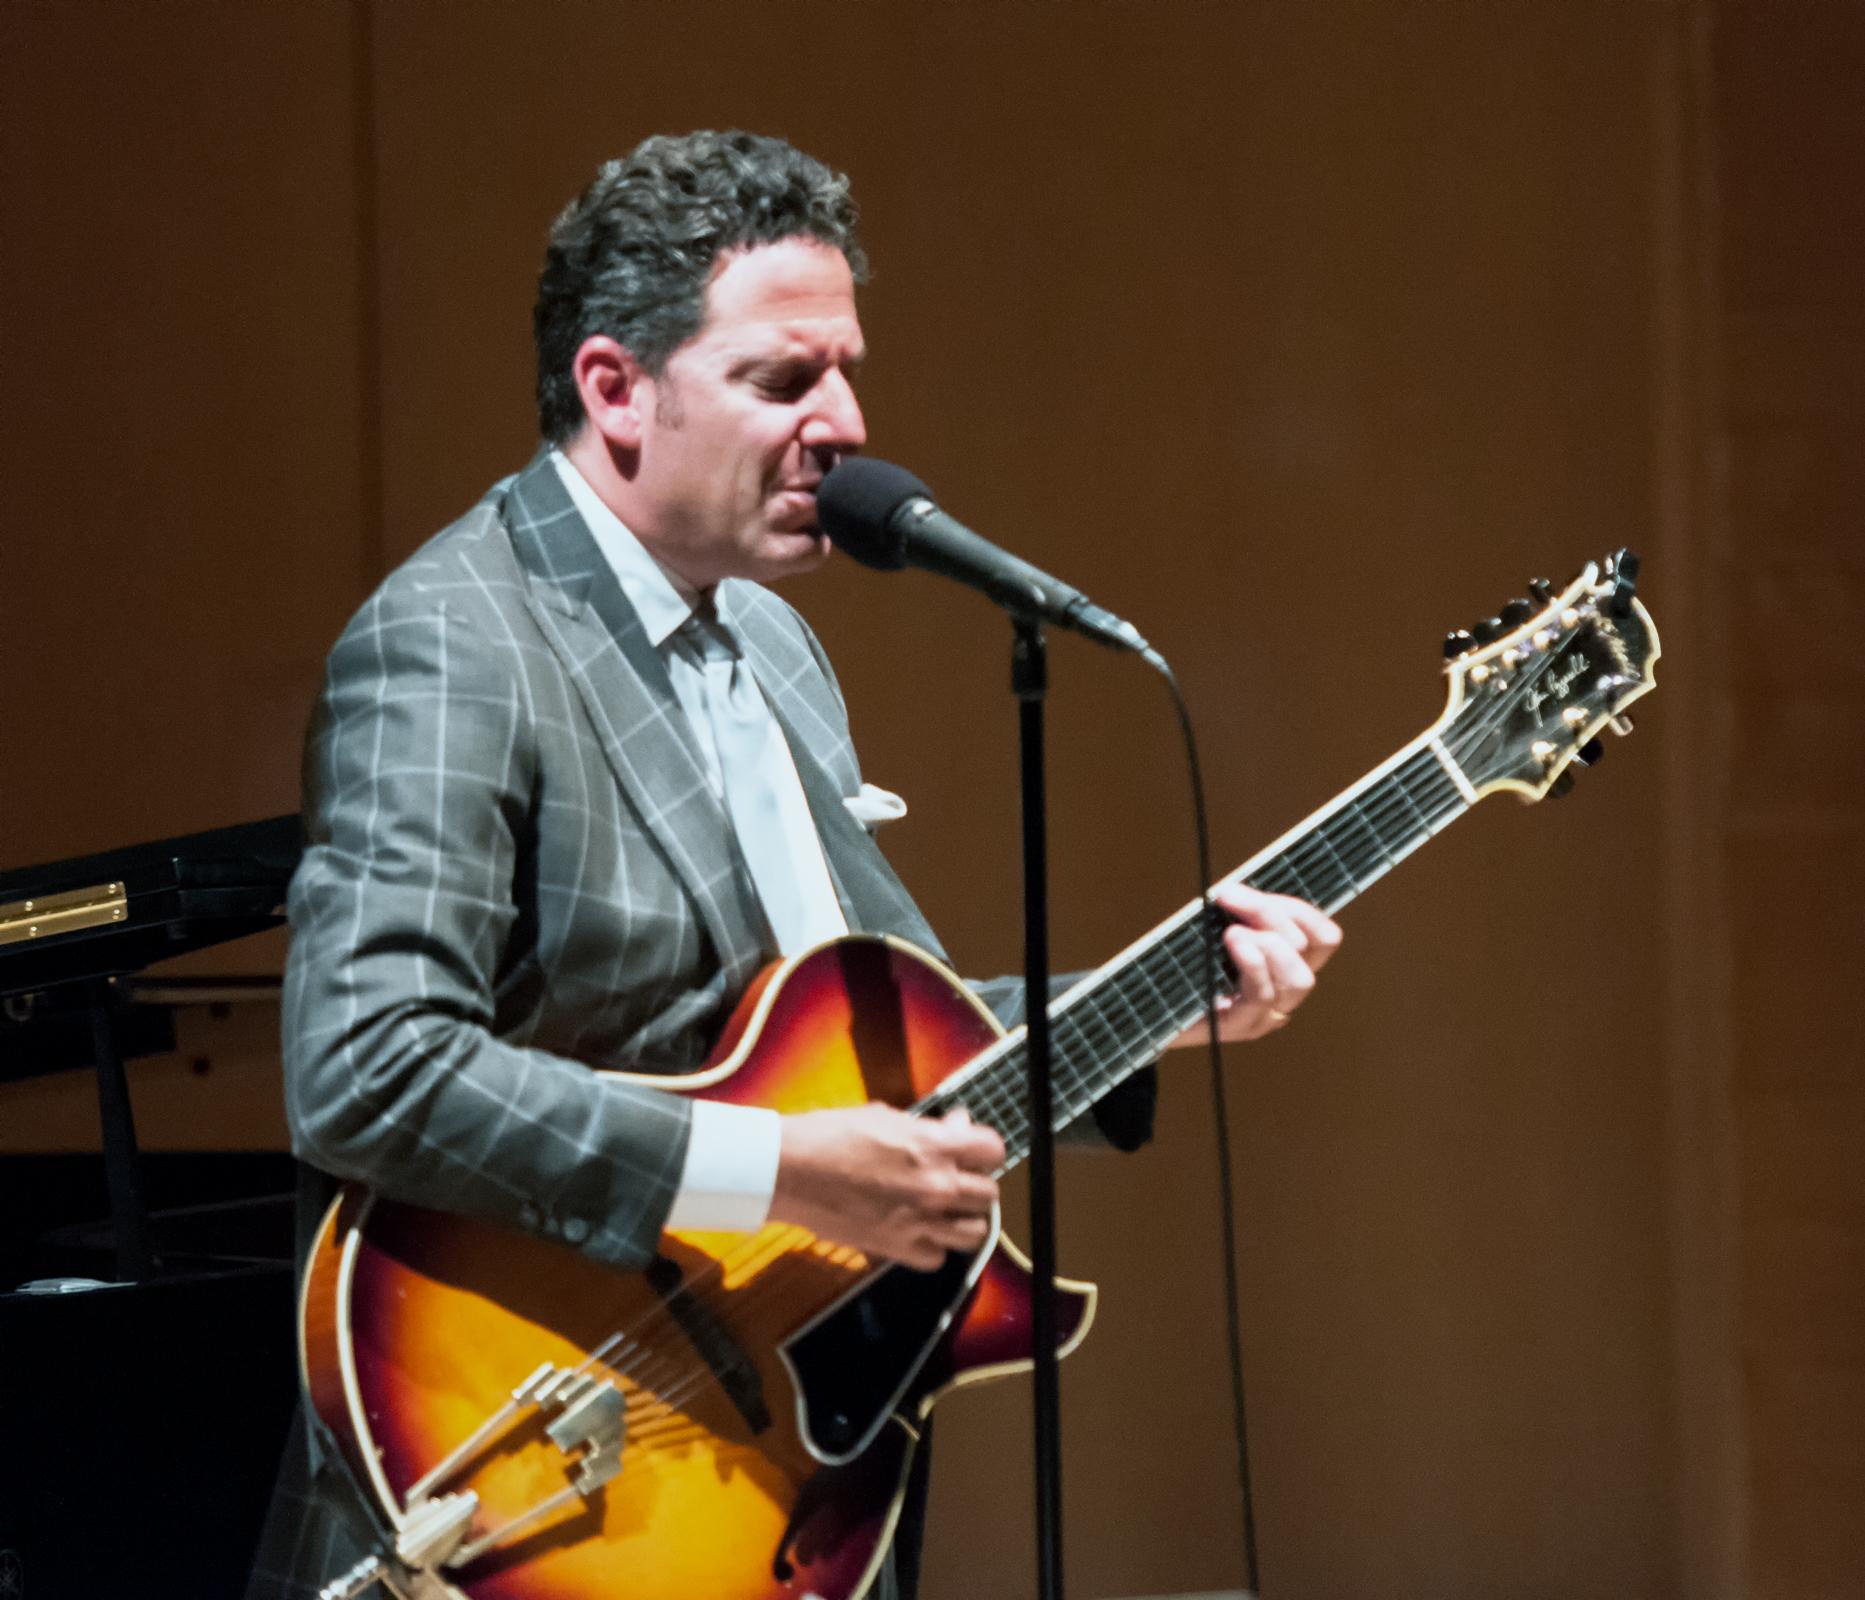 John Pizzarelli With Quartet At The Musical Instrument Museum (mim) In Phoenix